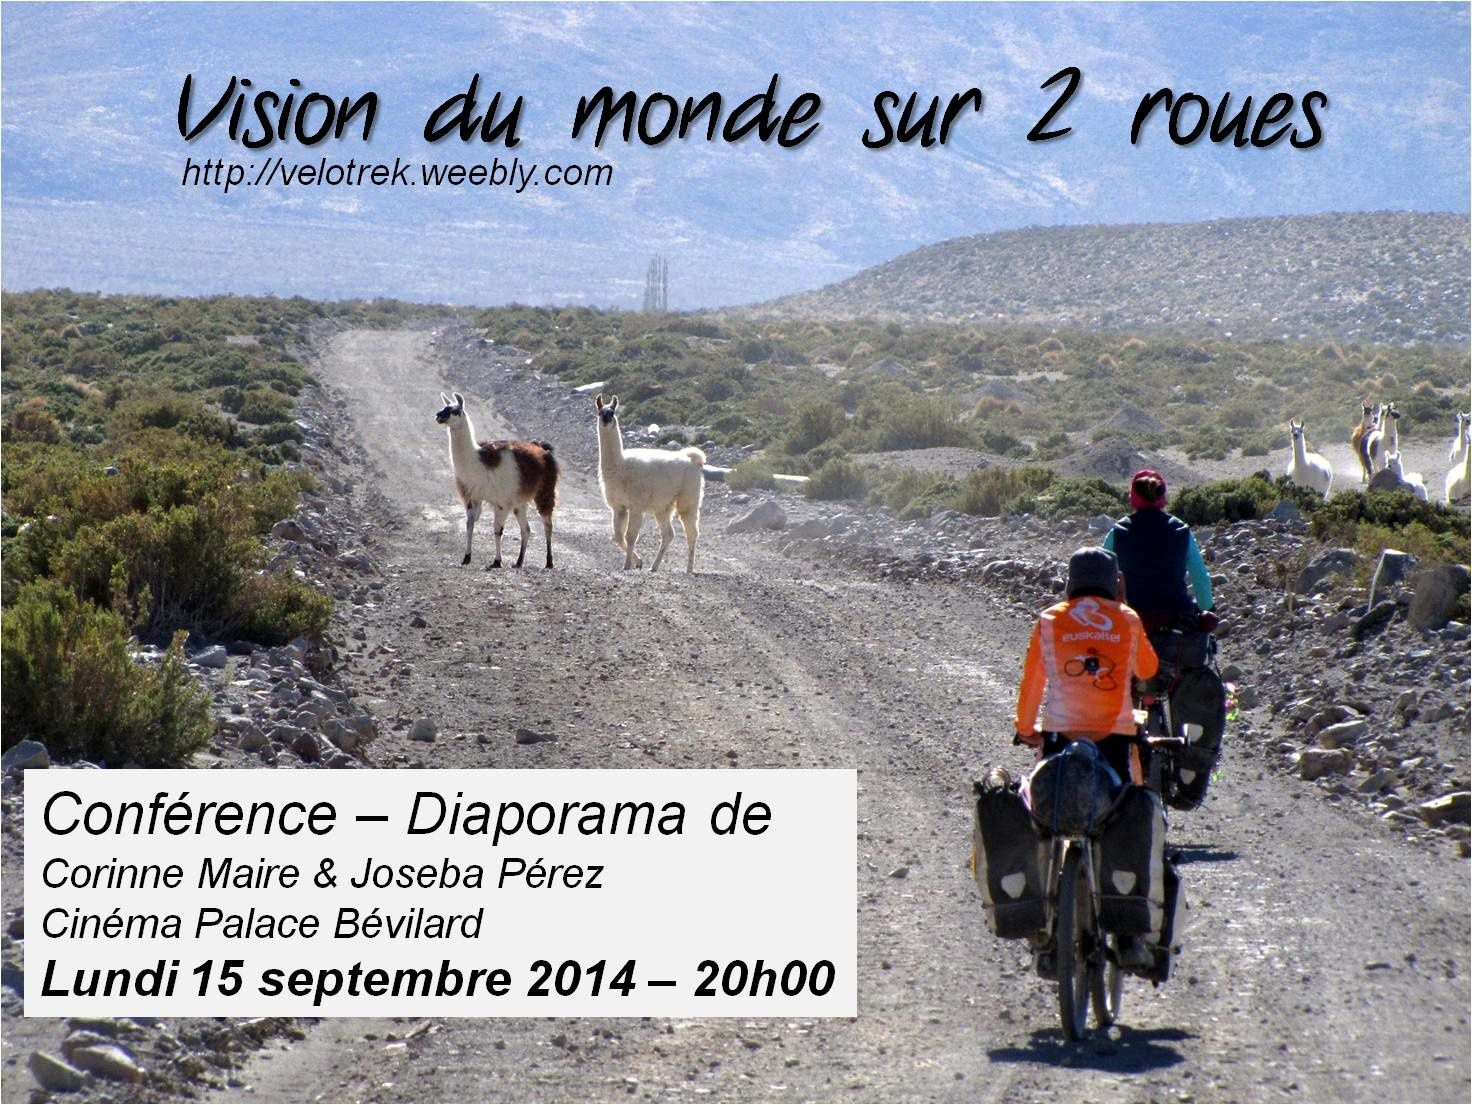 CONFERENCE: Cinéma Palace Bévilard, 15 septembre 2014 20h